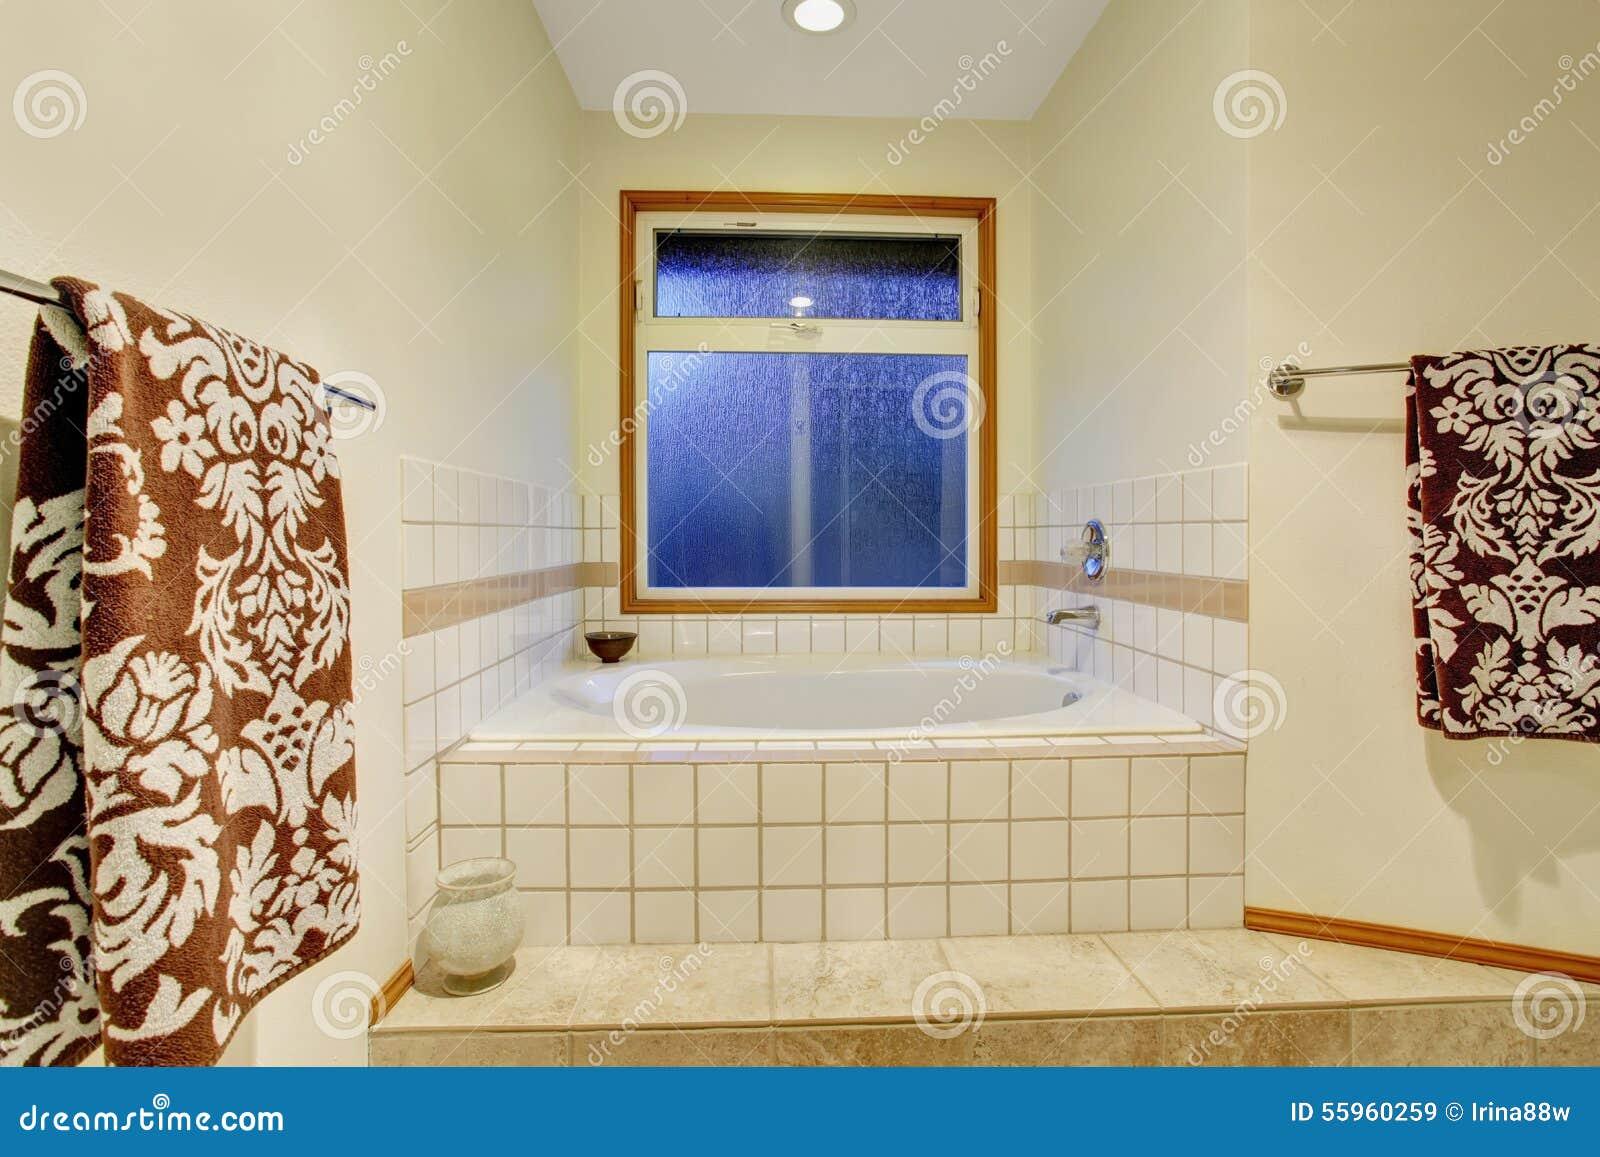 Nice Master Bathroom With Jacuzzi Tub. Stock Image - Image of brown ...